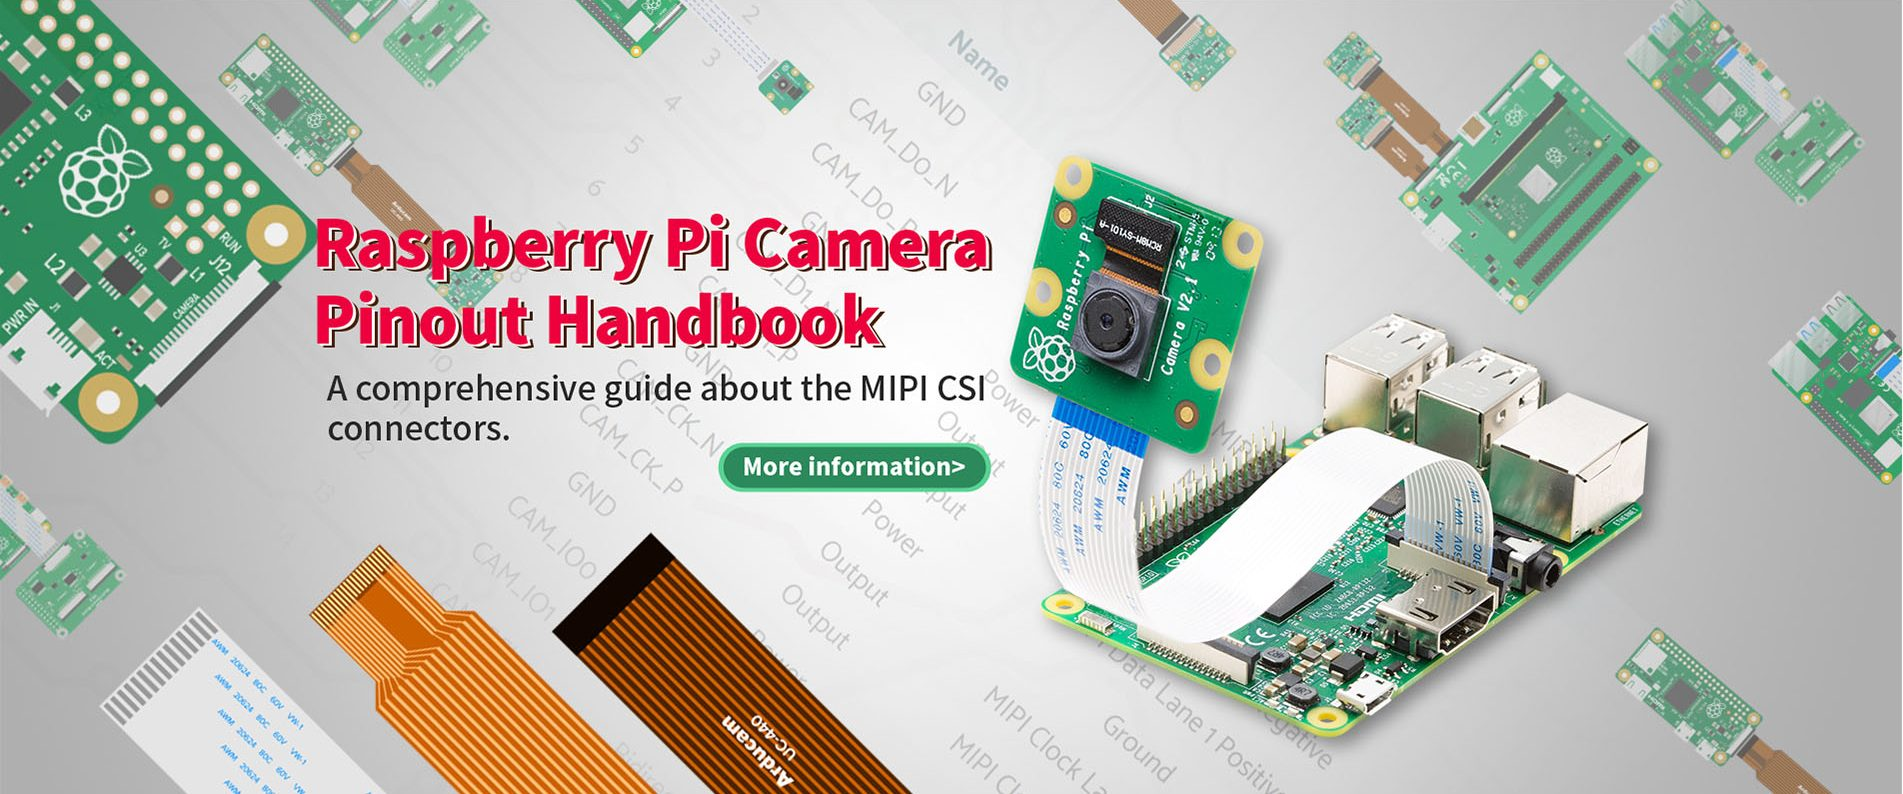 Raspberry Pi Camera Pinout Handbook banner 1